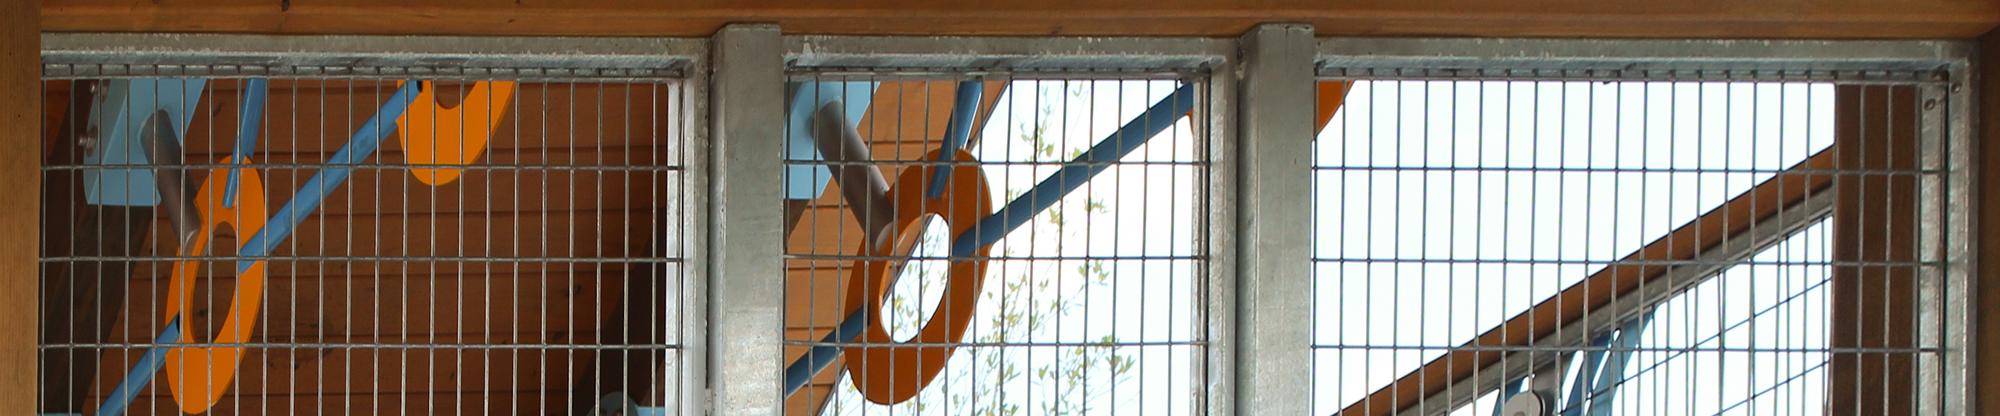 Cladding Infill Panels : Infill panels wall custom fabrication